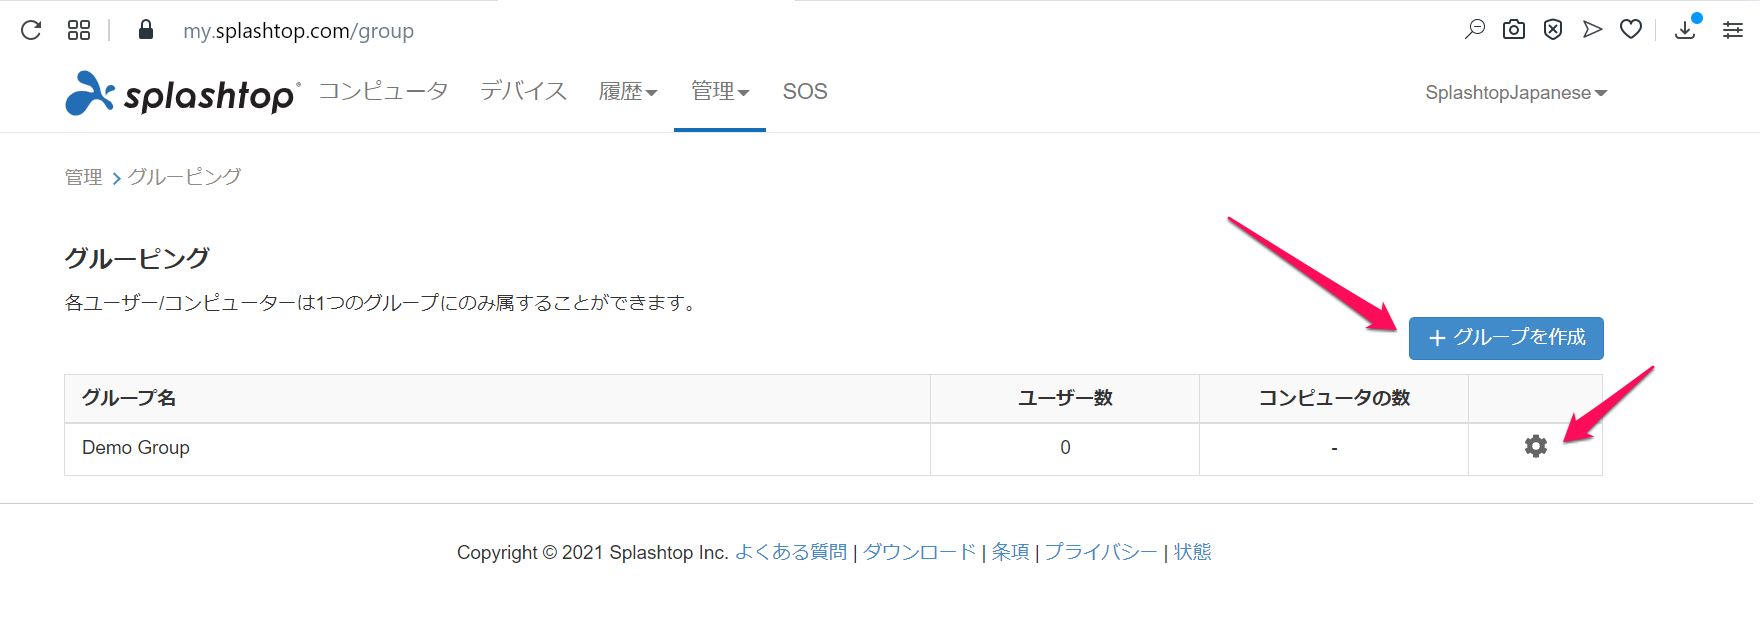 Grouping_ja.png